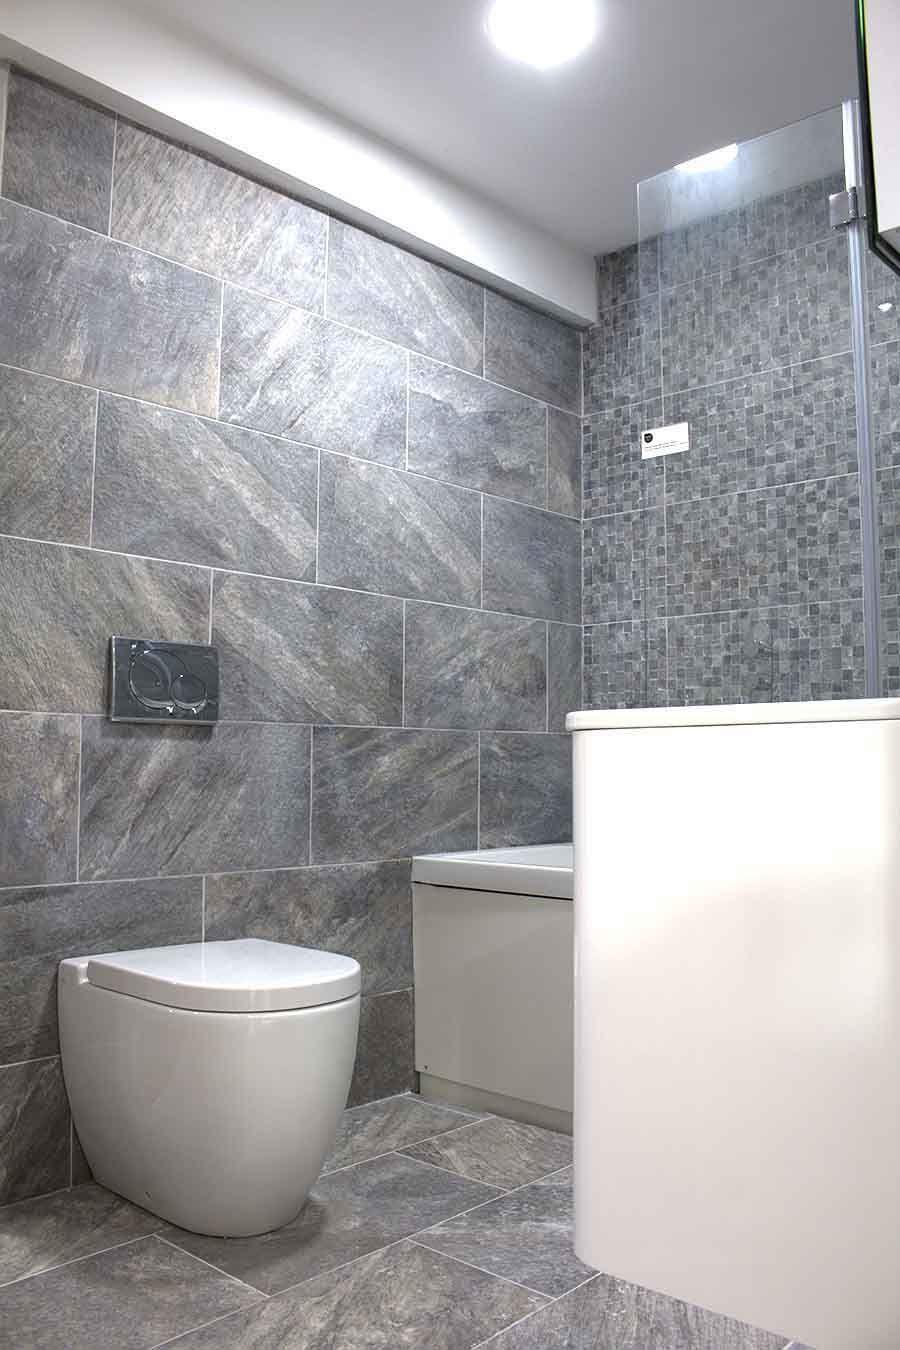 Superb Marazi Stone Effect Porcelain Wall And Floor Tiles In A Modern Bathroom  Display